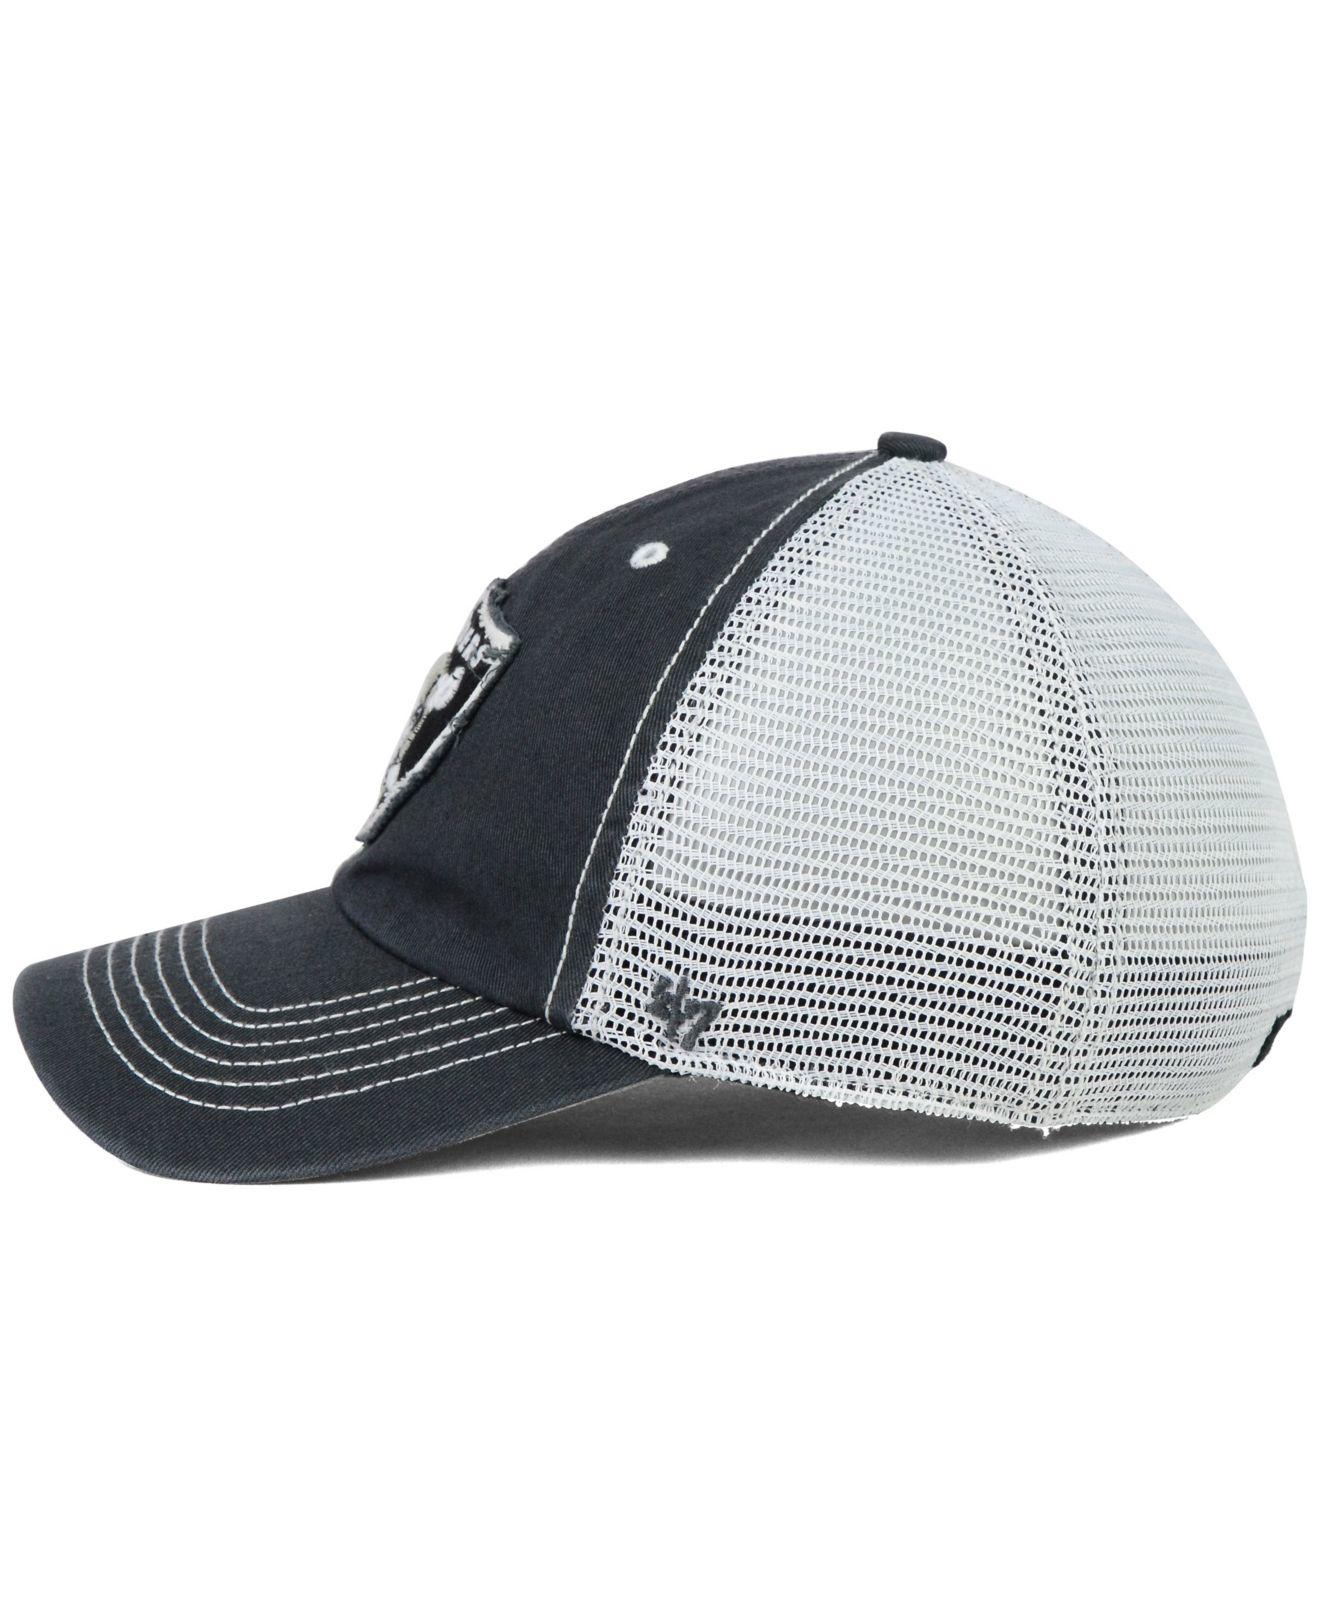 top quality oakland raiders 47 brand hat 38384 cc1fb